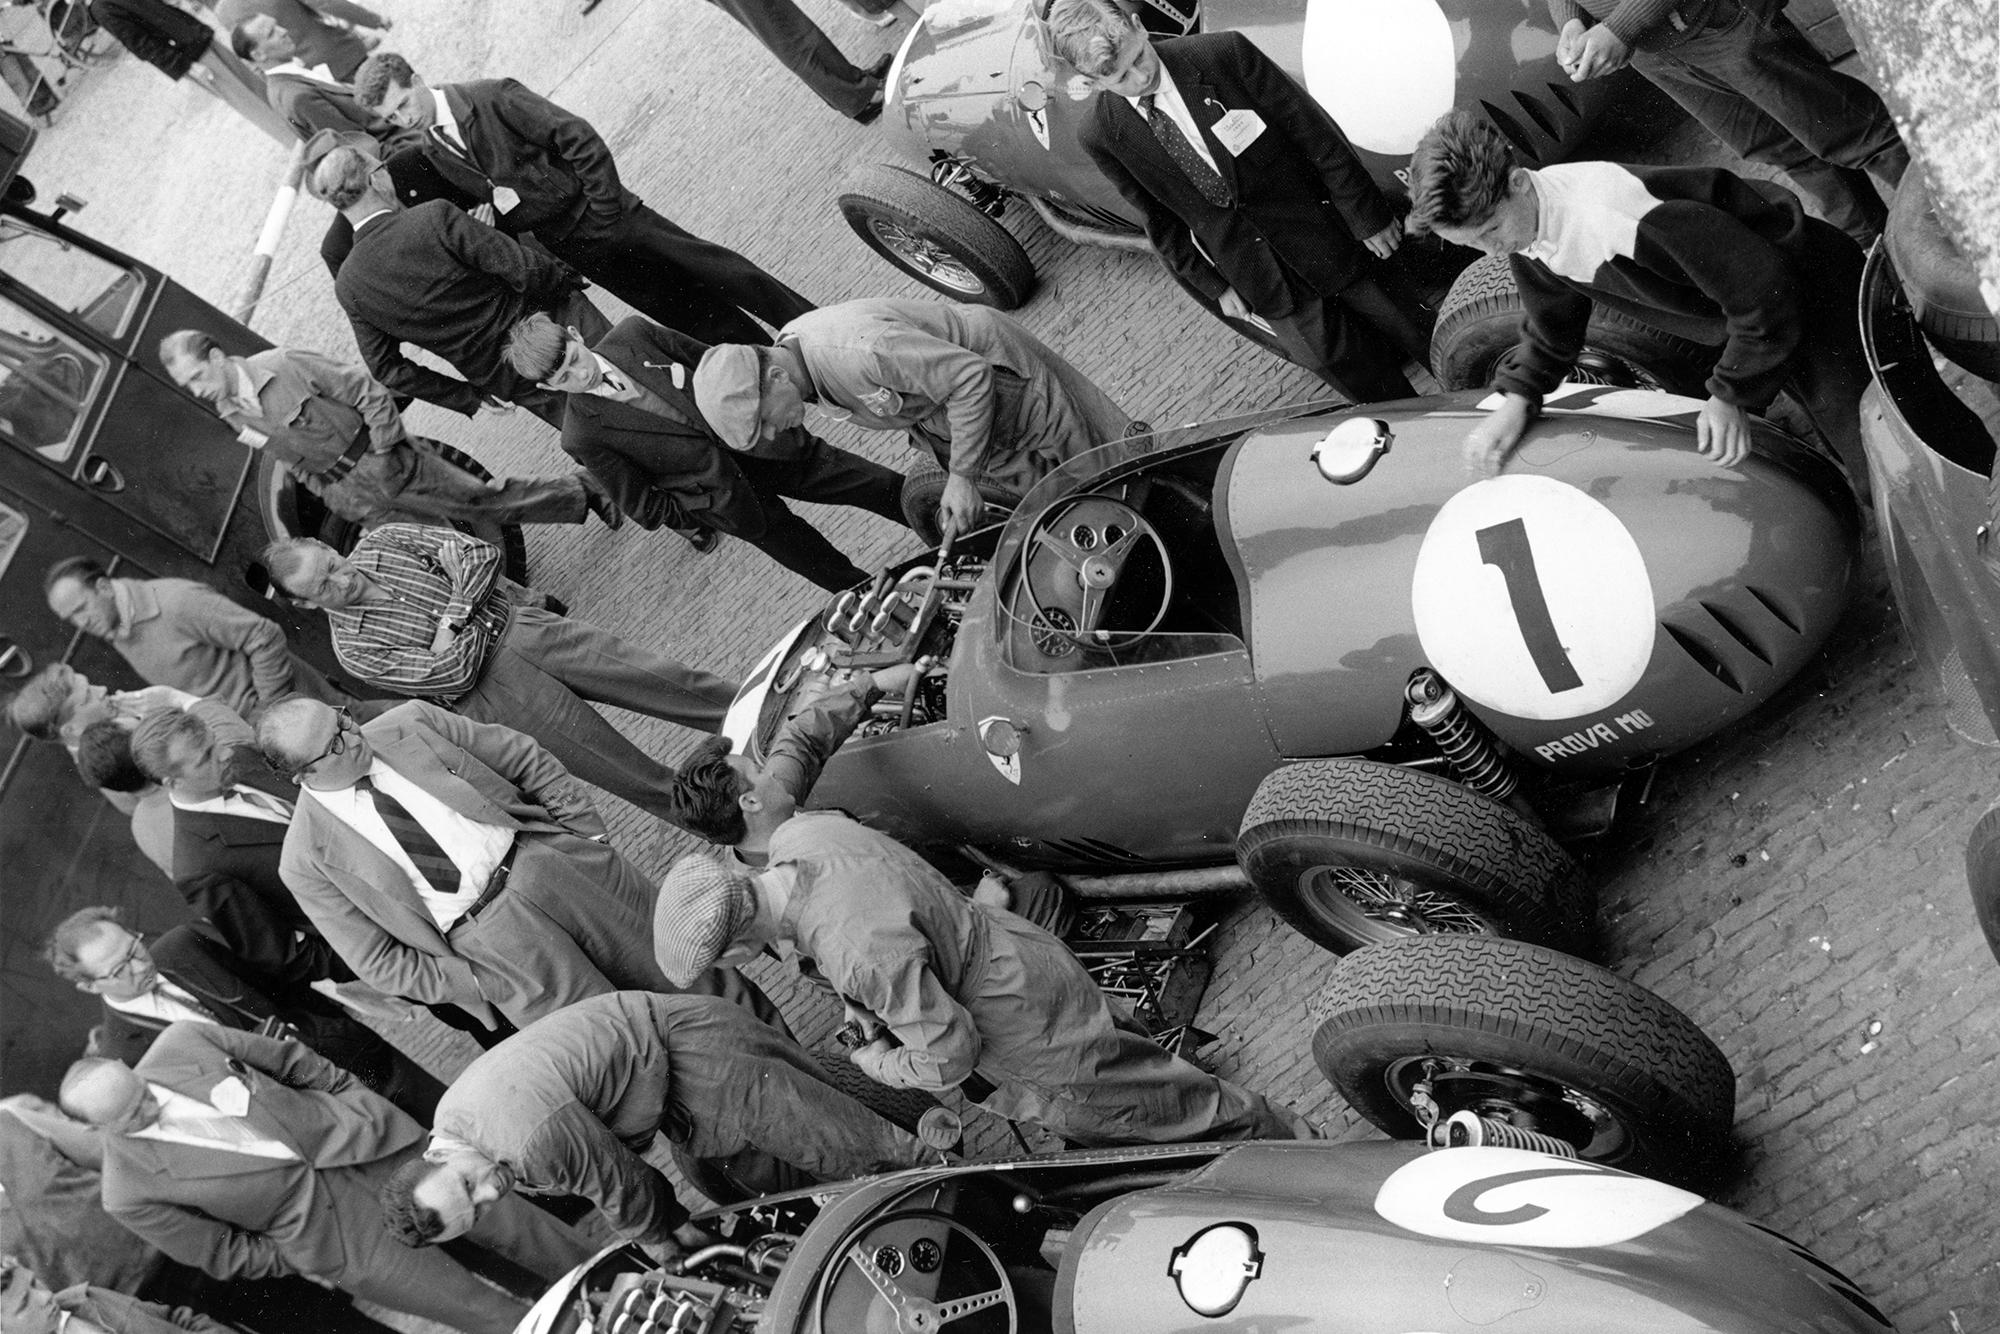 In the paddock Carlo Chiti (glasses, centre) overseas mechanics working on the Ferrari Dino 246 of Jean Behra.